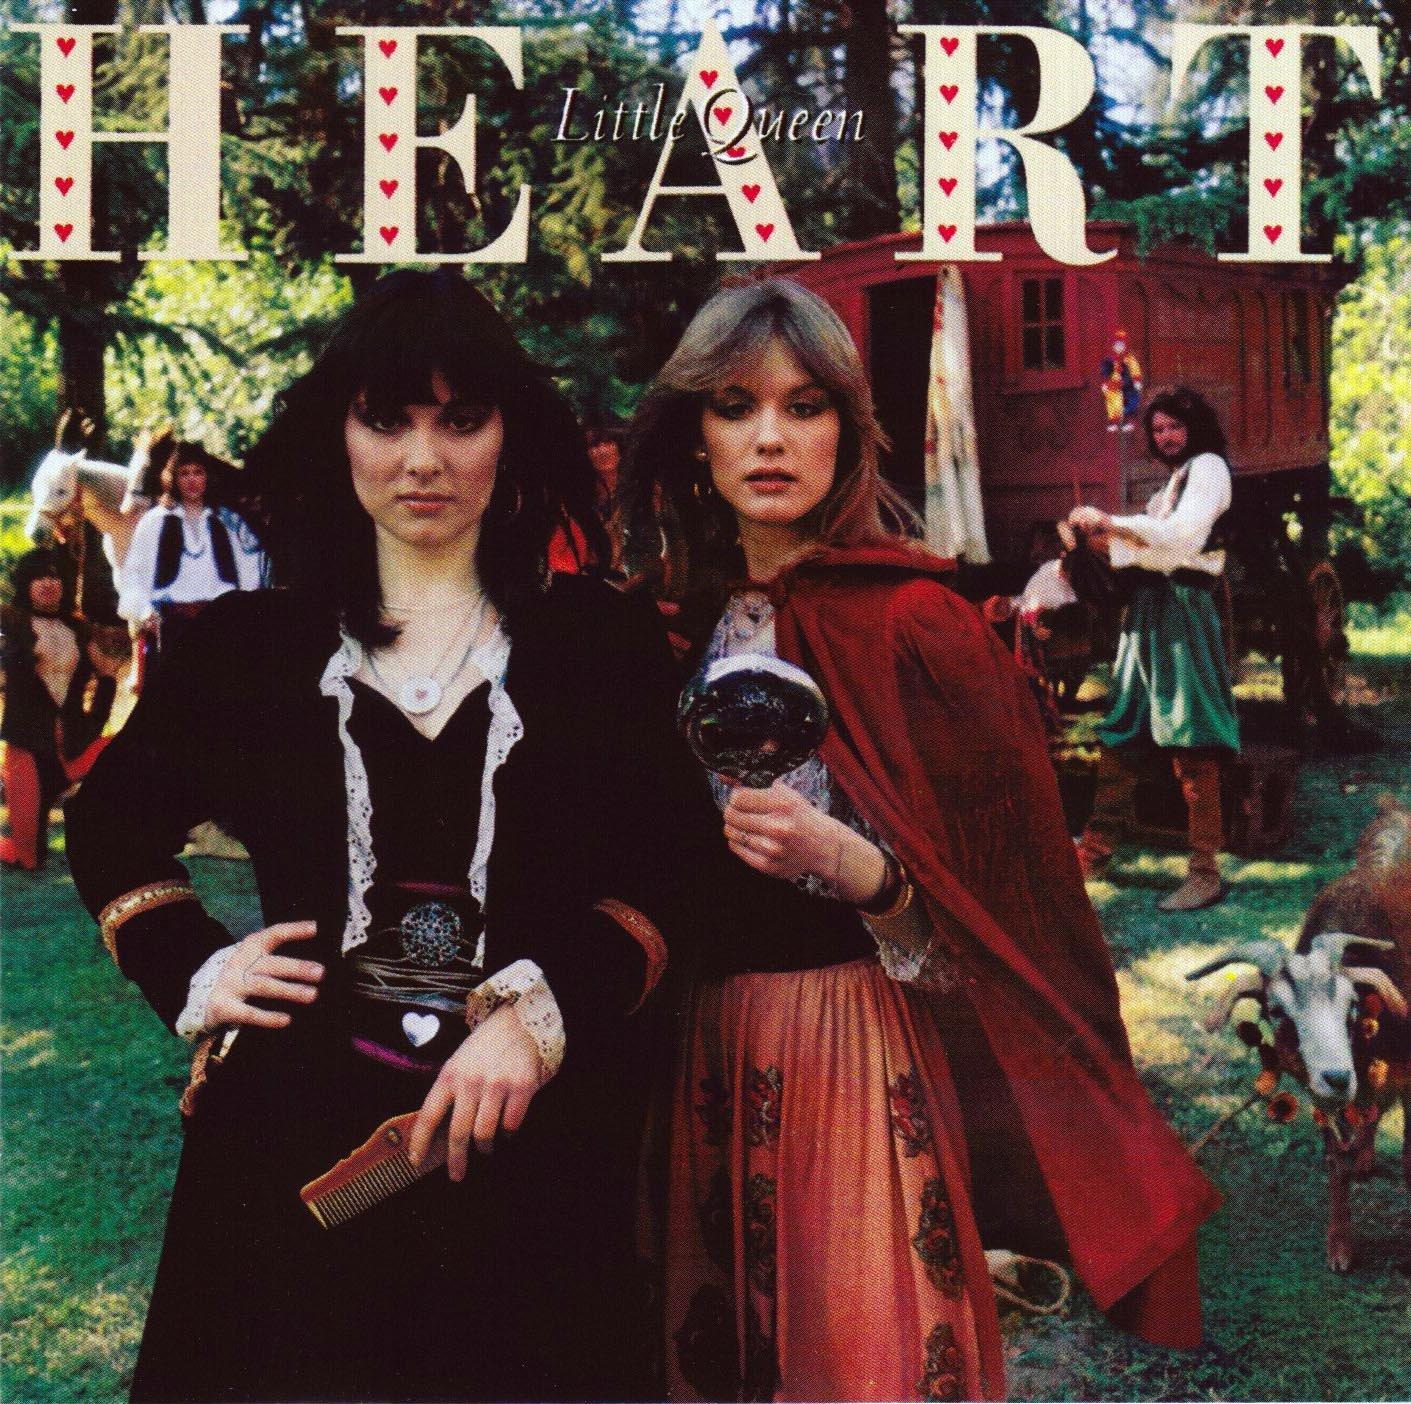 heart Top 25 Songs of 1977